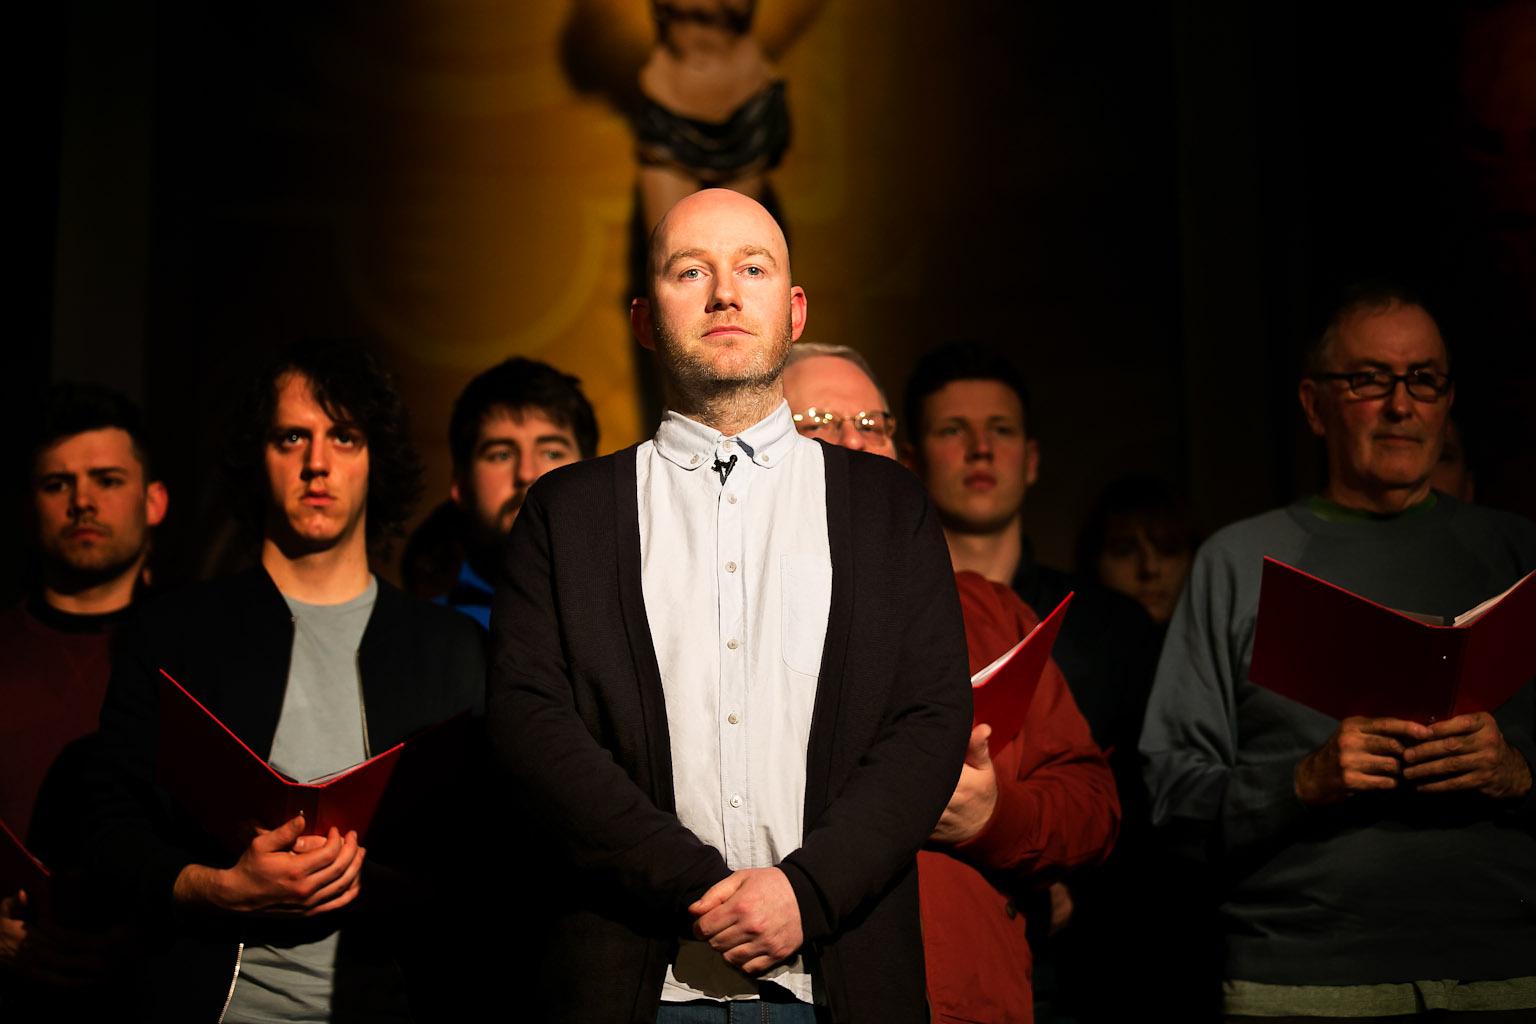 Theology - Martin O' Connor